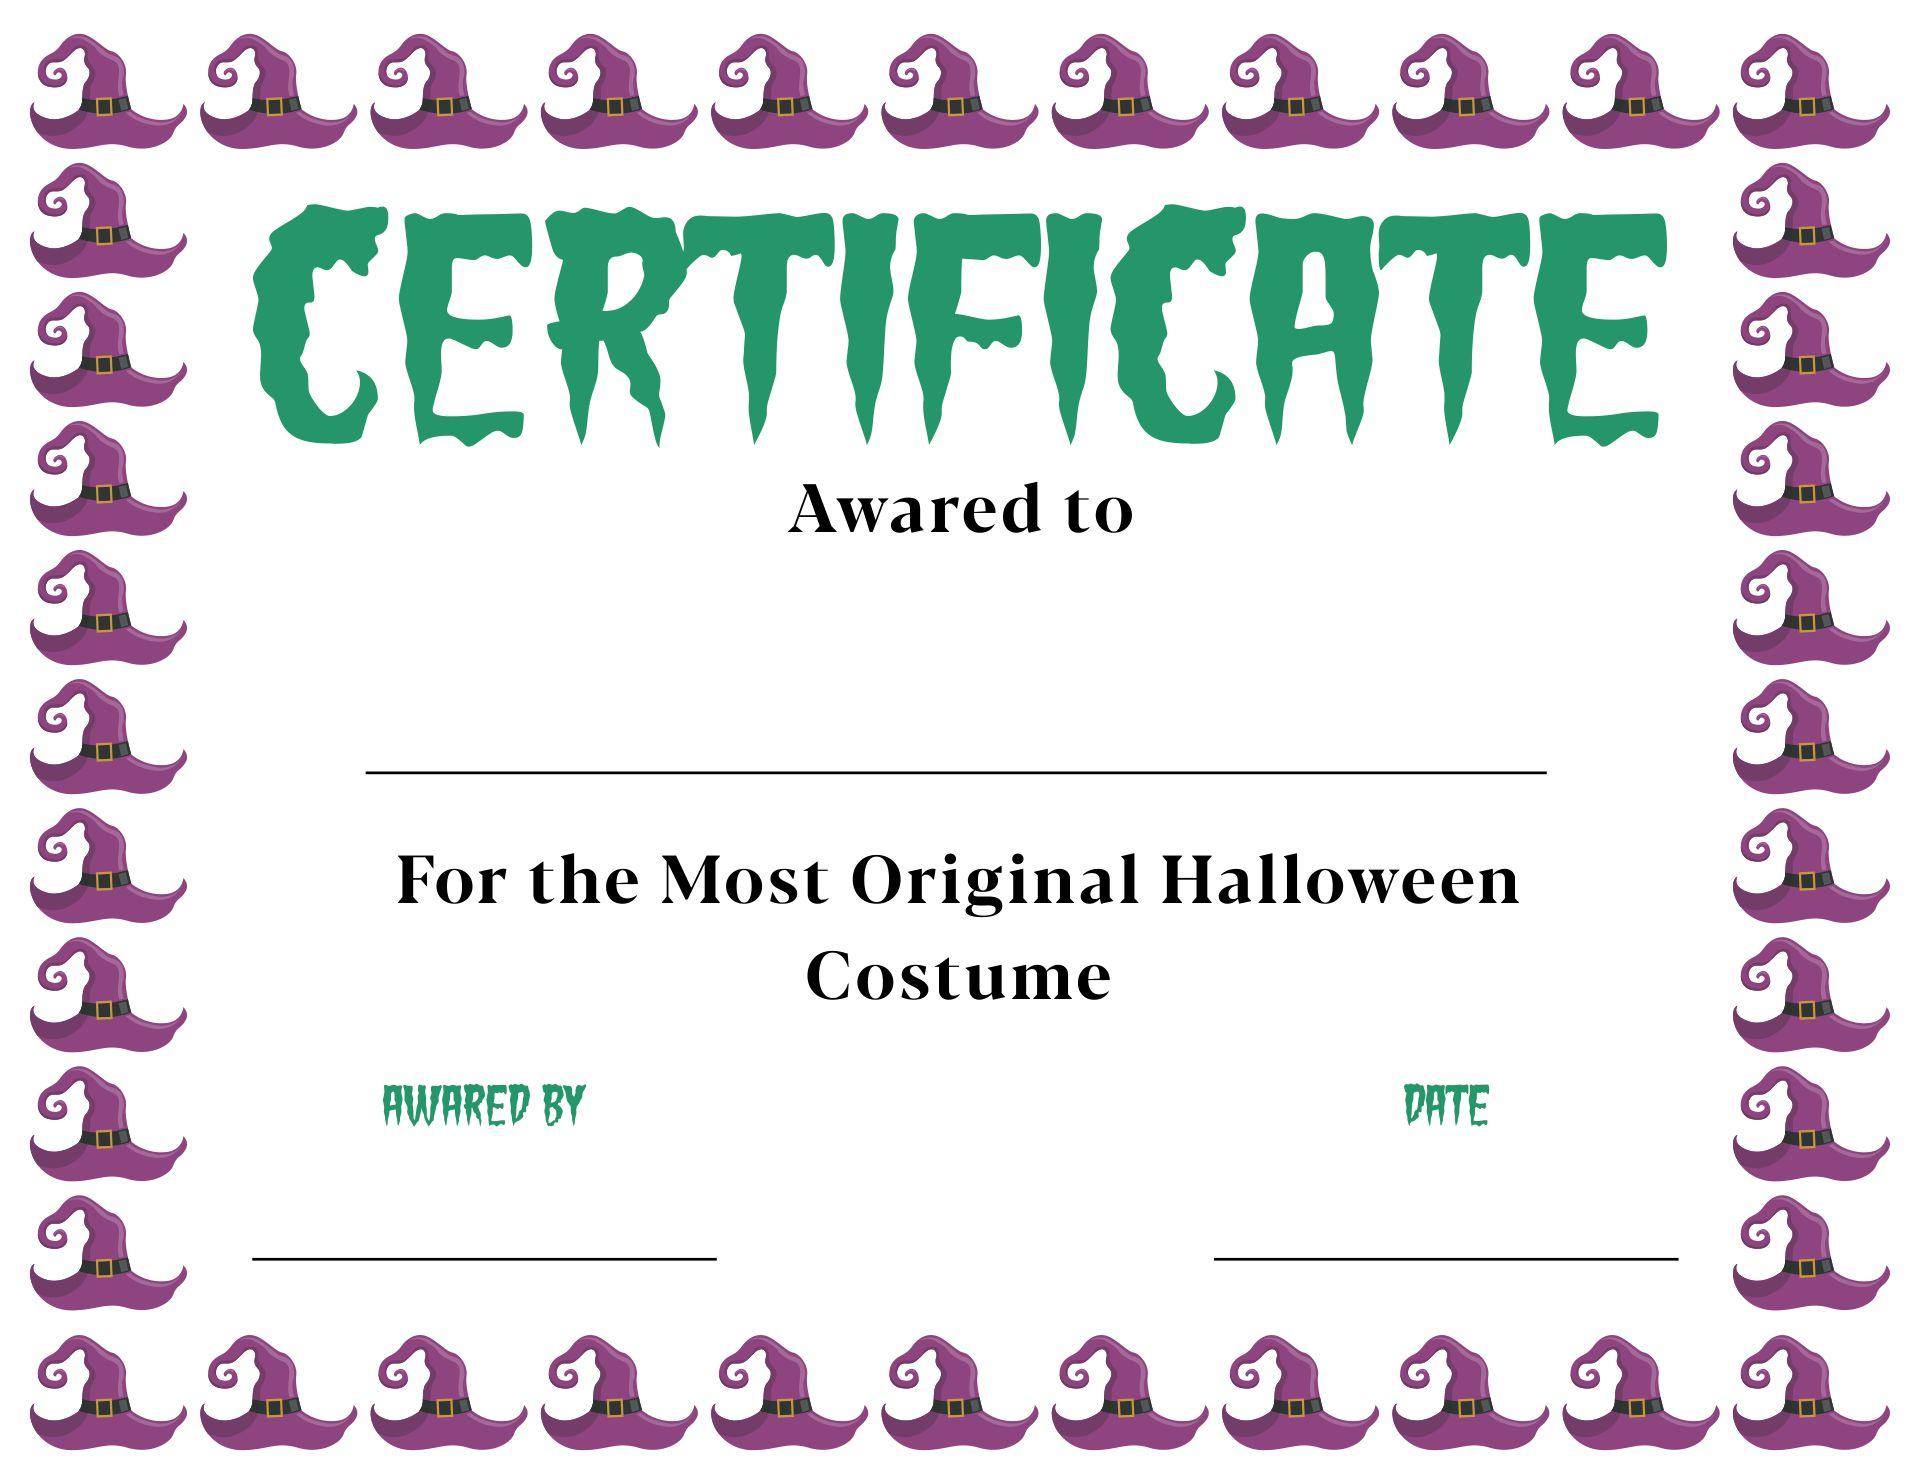 Halloween Costume Awards Printable